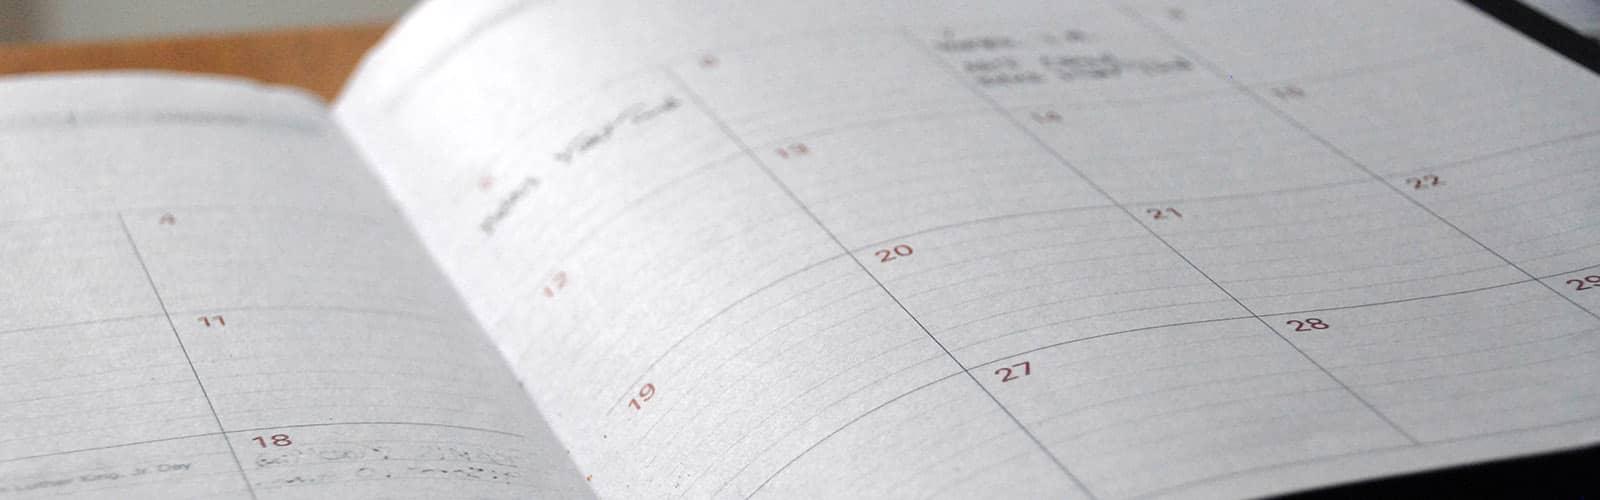 Understanding your timescales